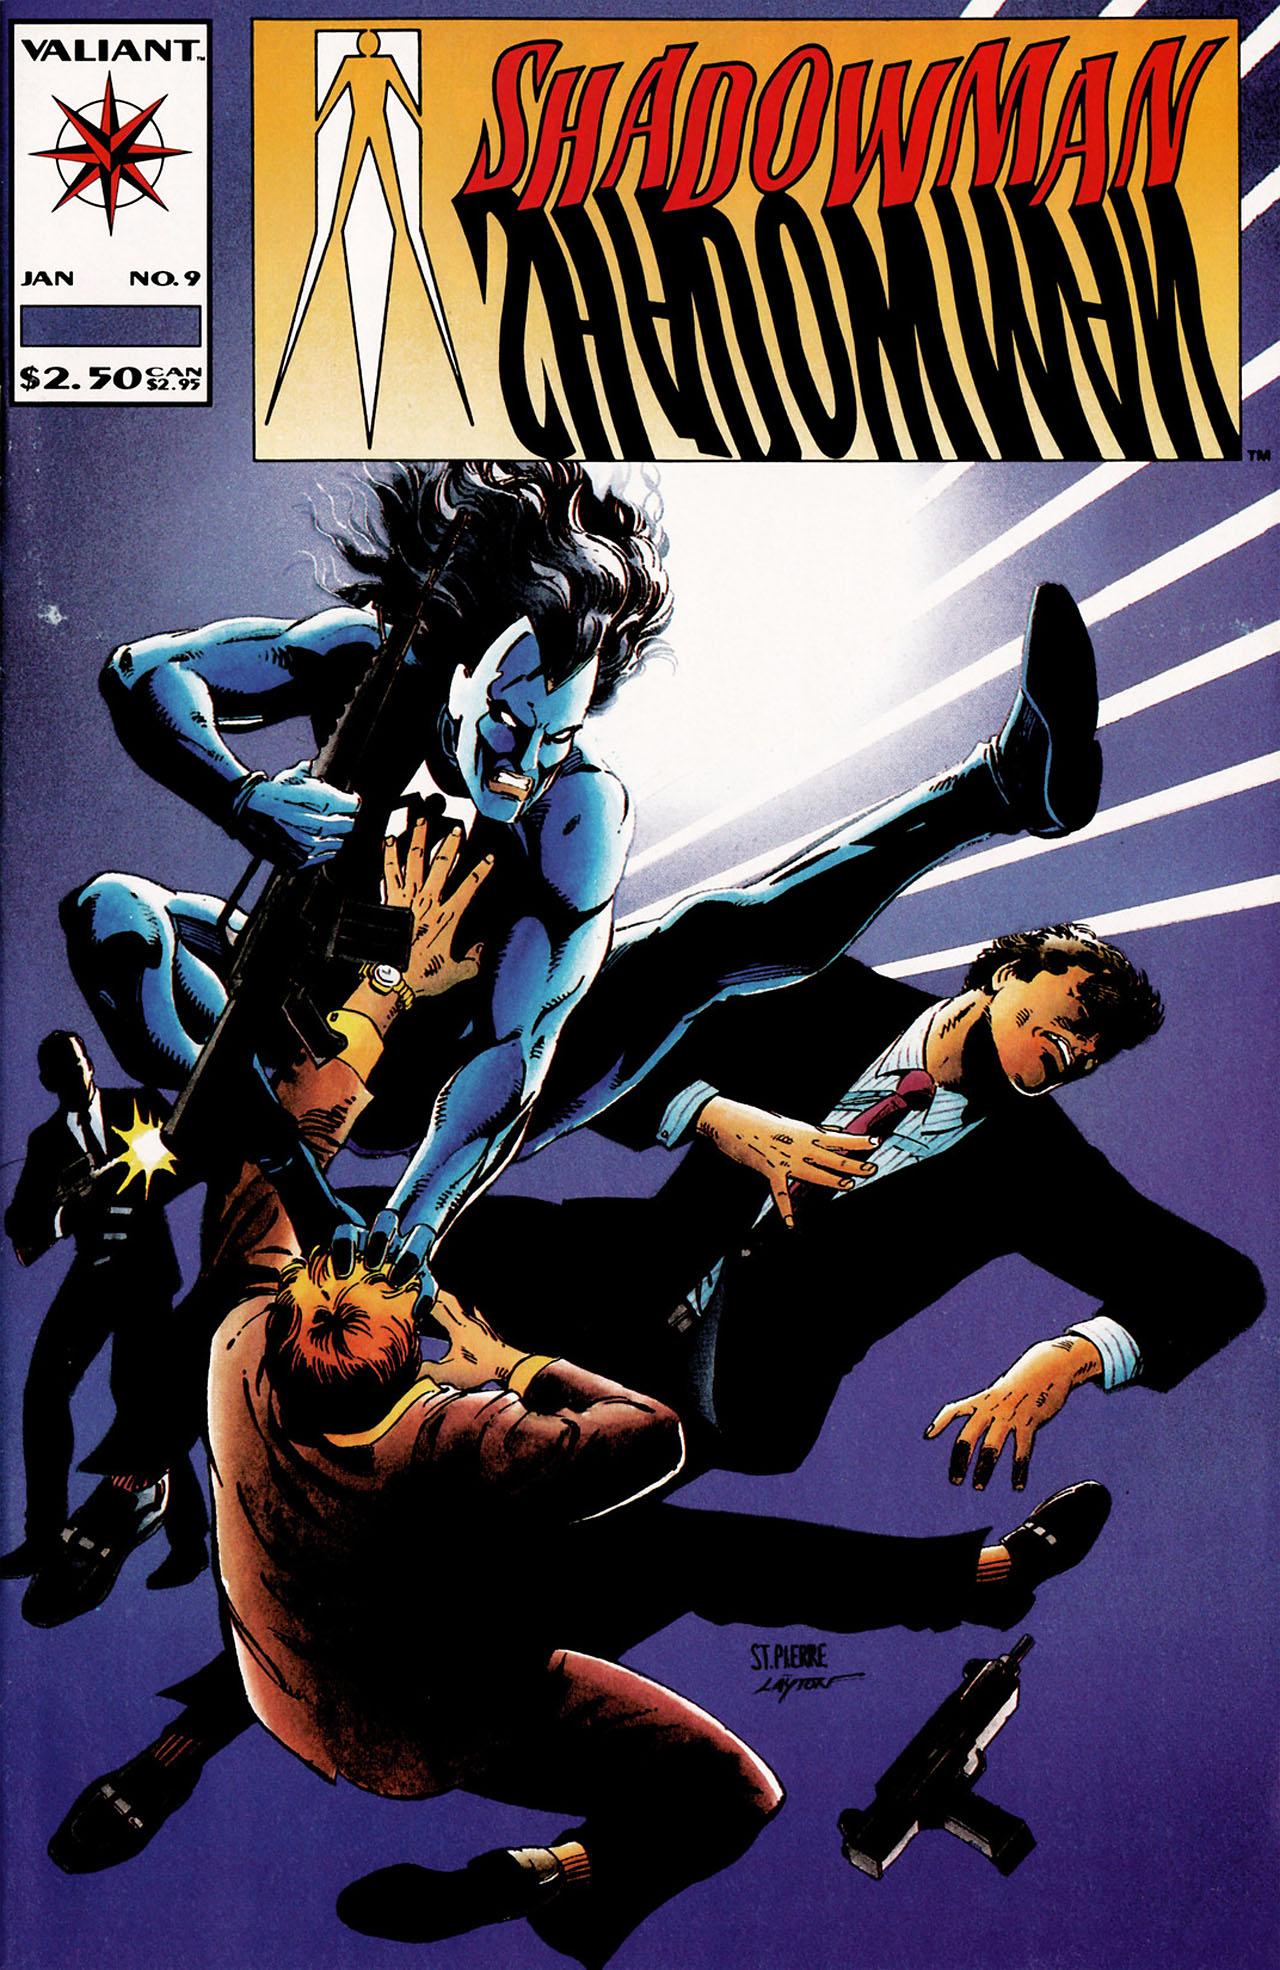 Read online Shadowman (1992) comic -  Issue #9 - 1